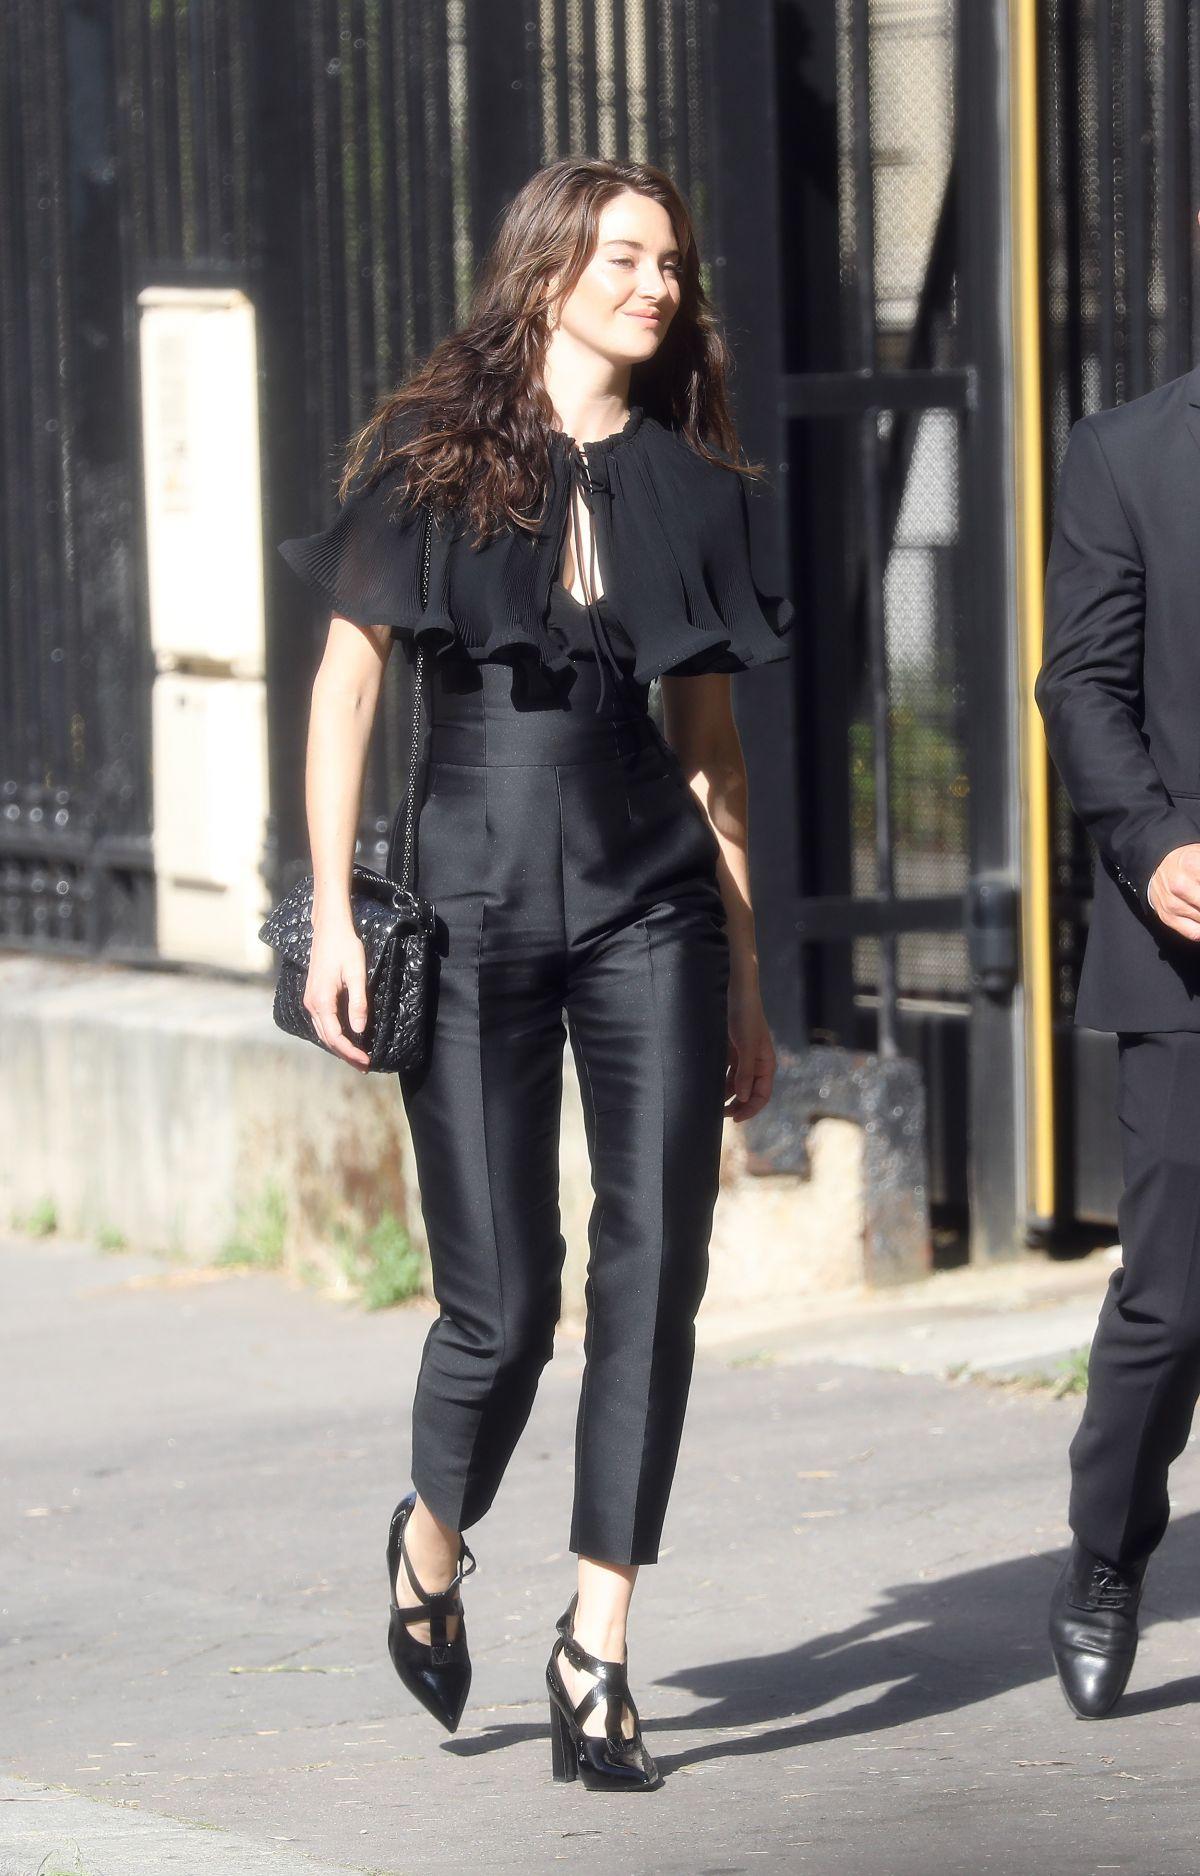 Shailene Woodley Arrives At Zoe Kravitz And Karl Glusman